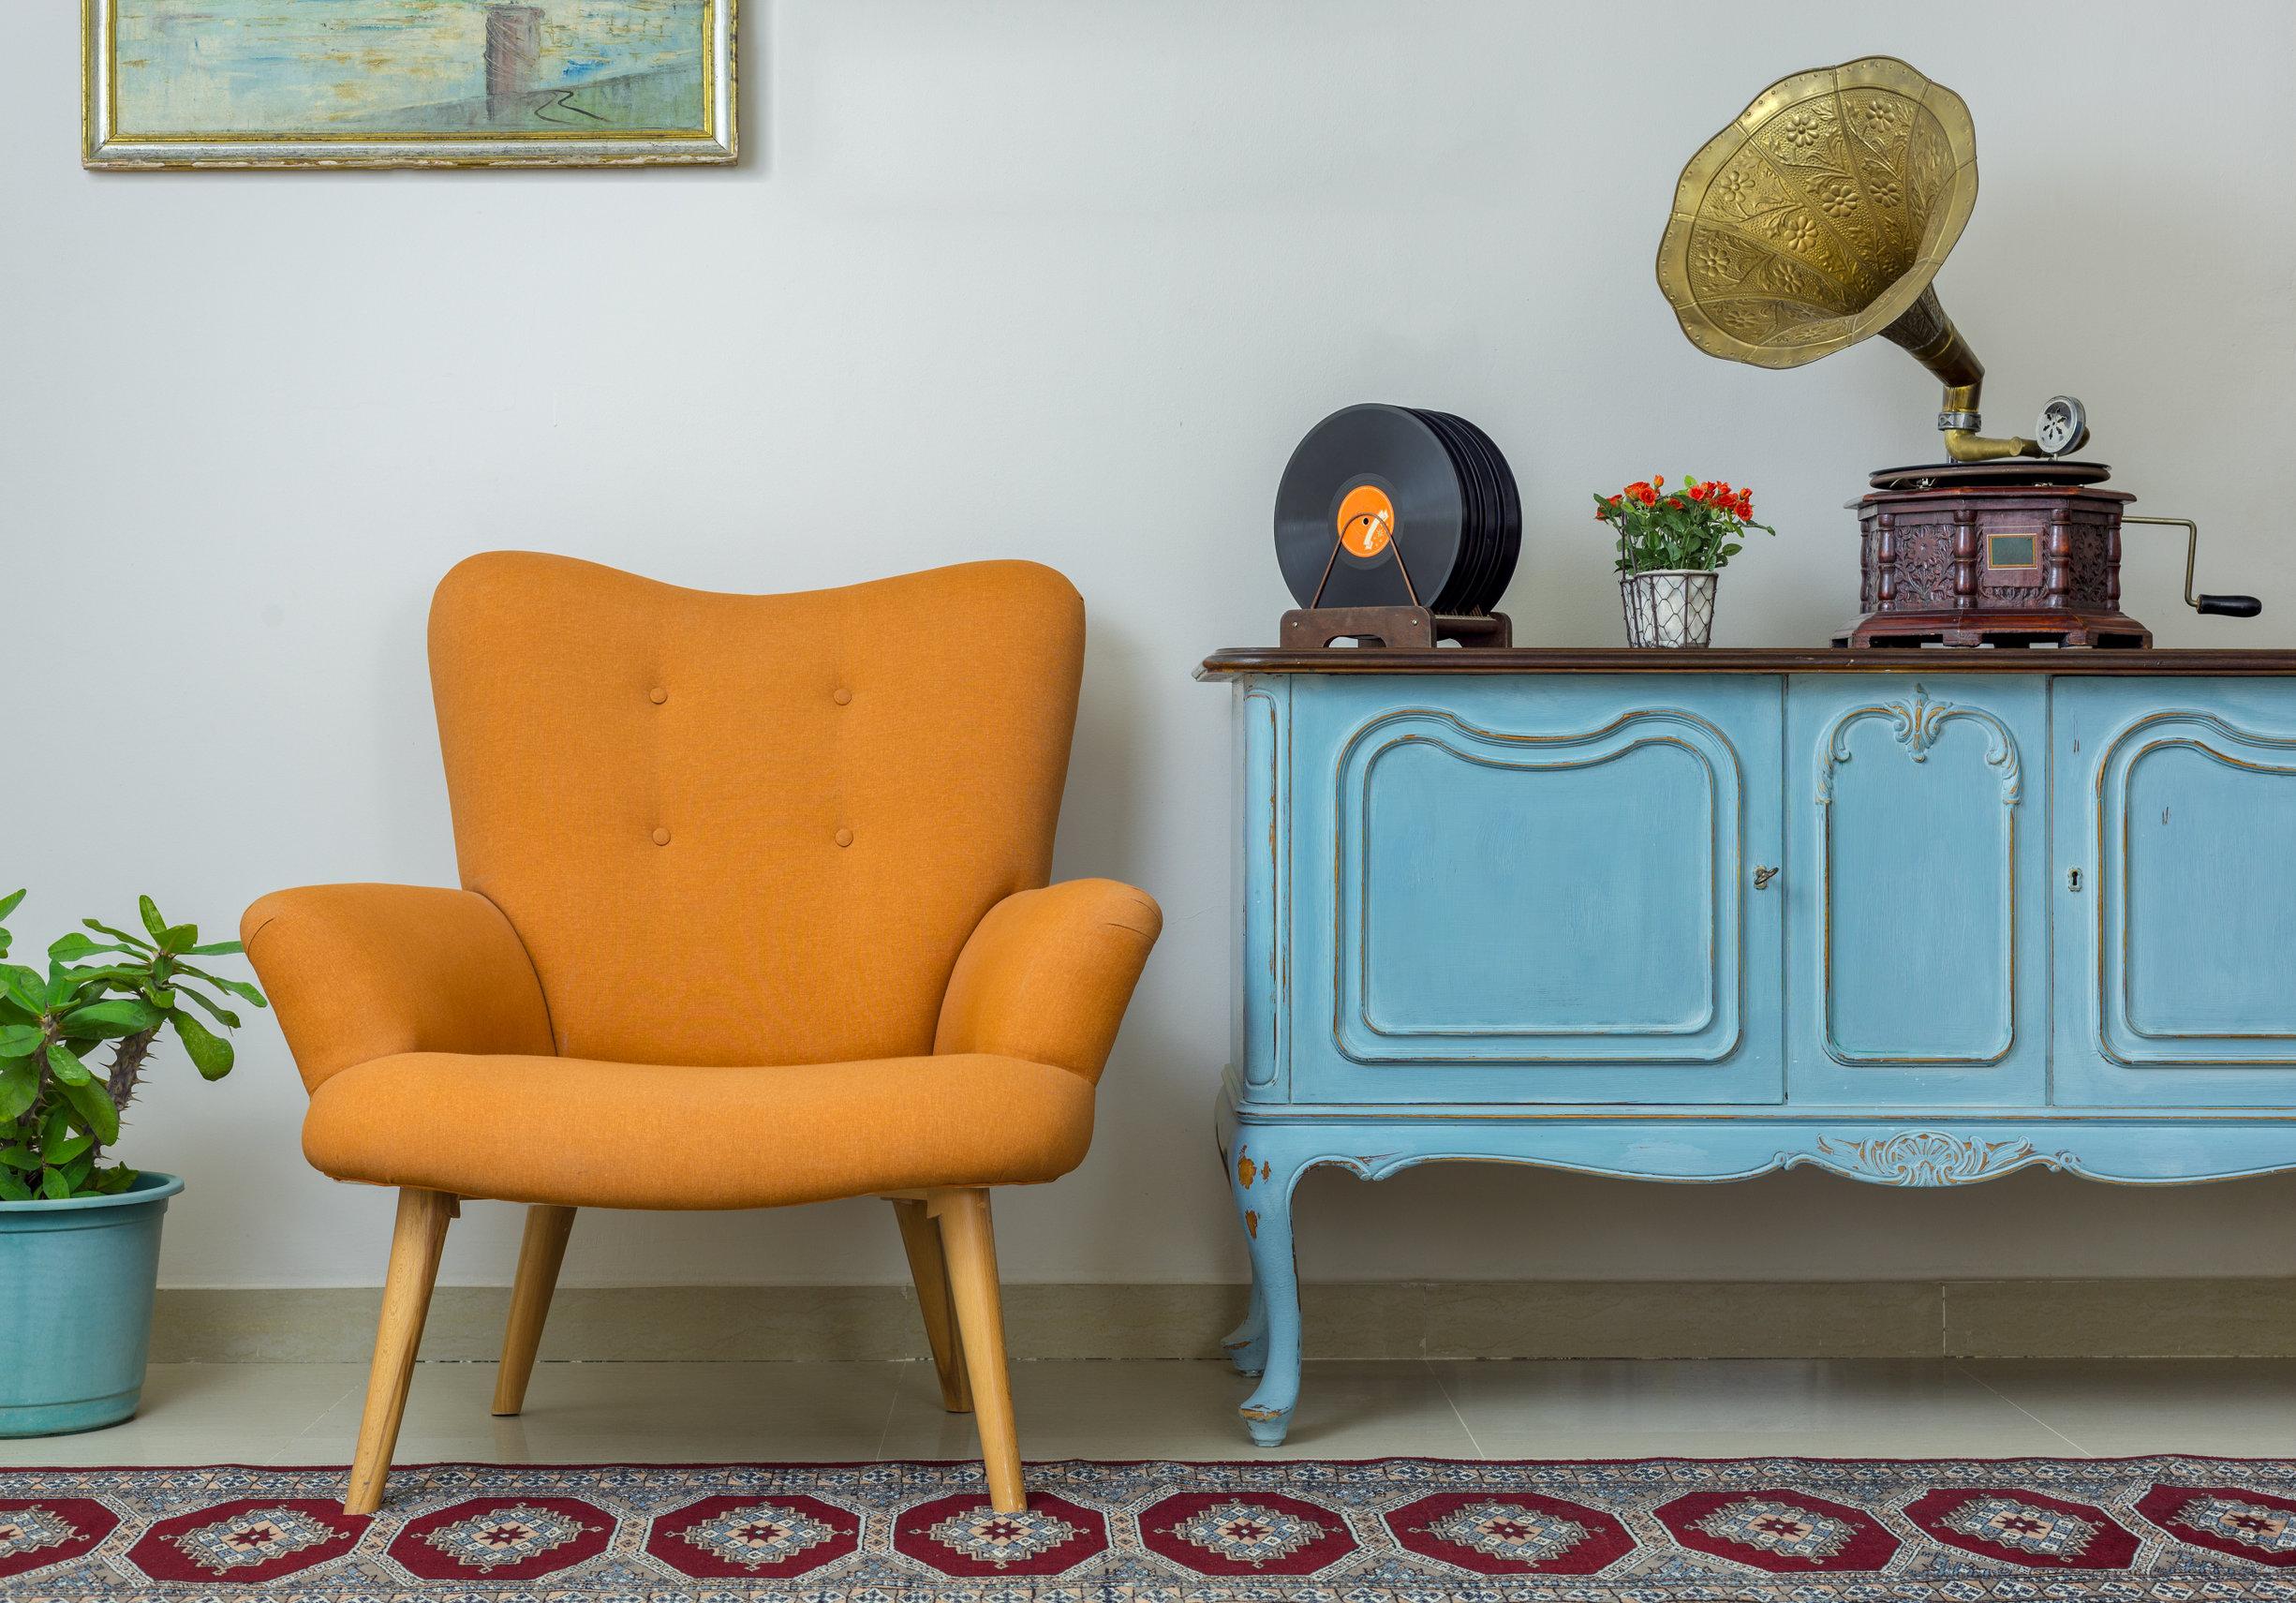 Retro Orange Armchair, Vintage Wooden Light Blue Sideboard, Old